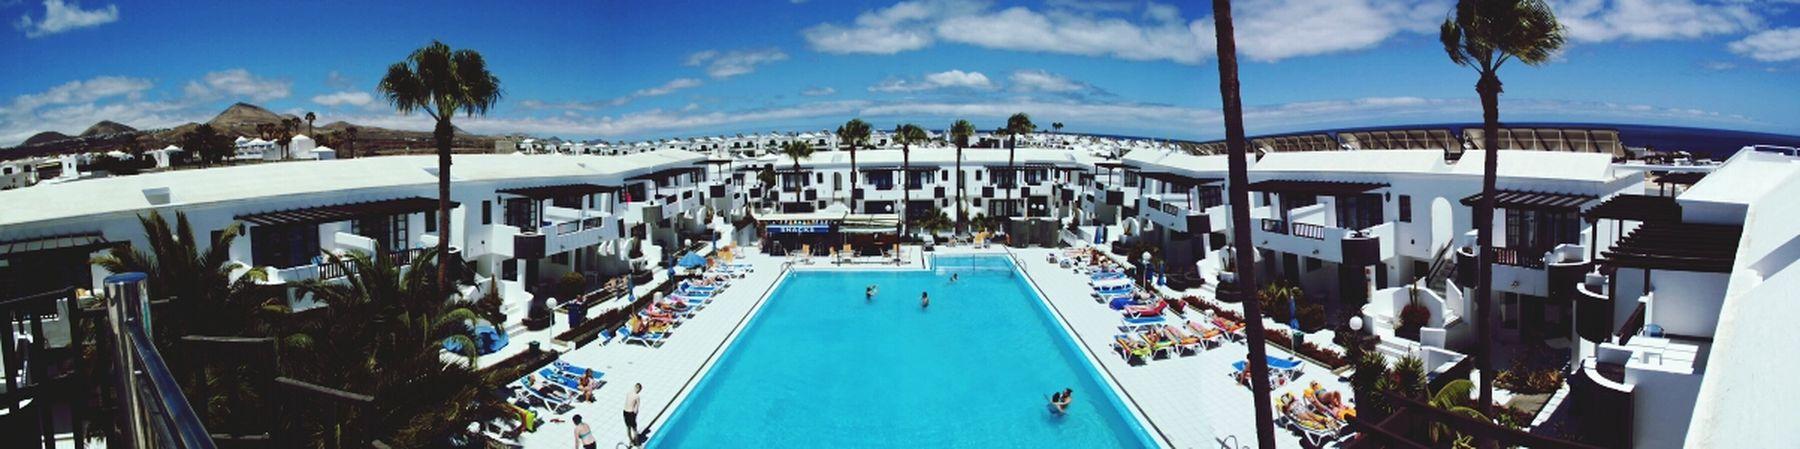 Leone Filter  Swiming Pool Holiday Panoramic